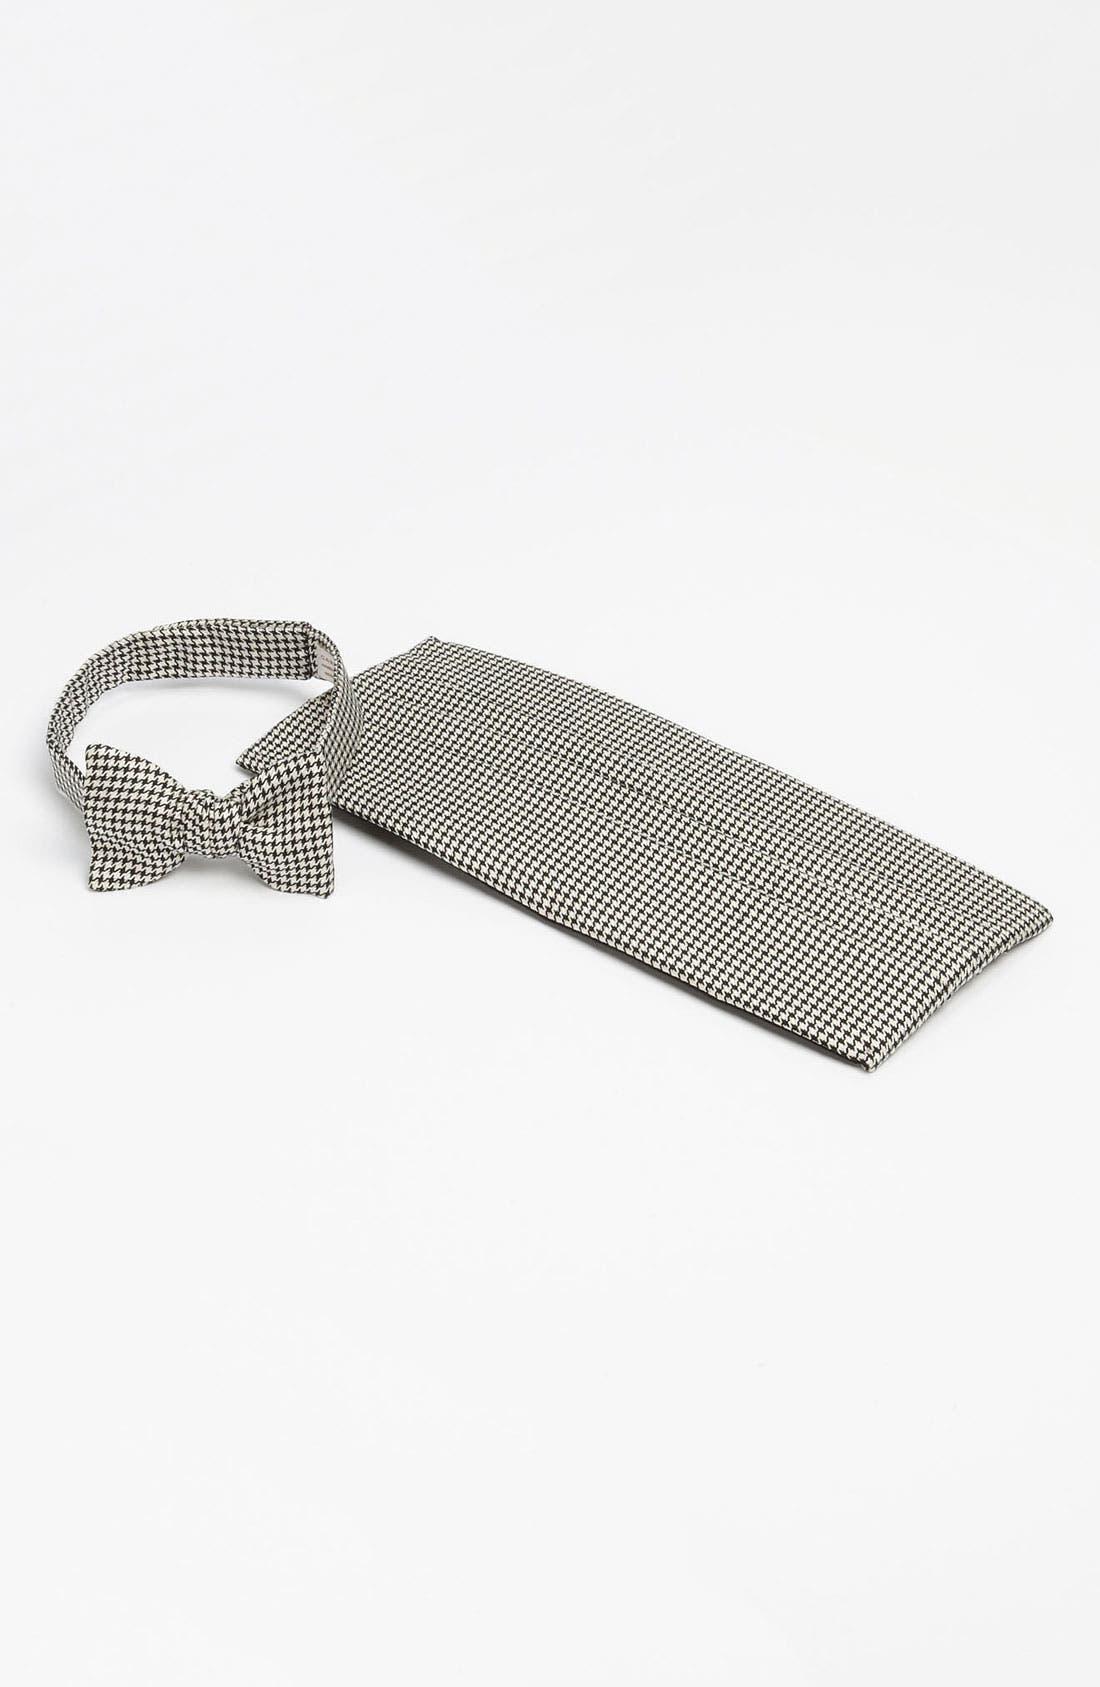 Main Image - Carrot & Gibbs Cummerbund & Bow Tie